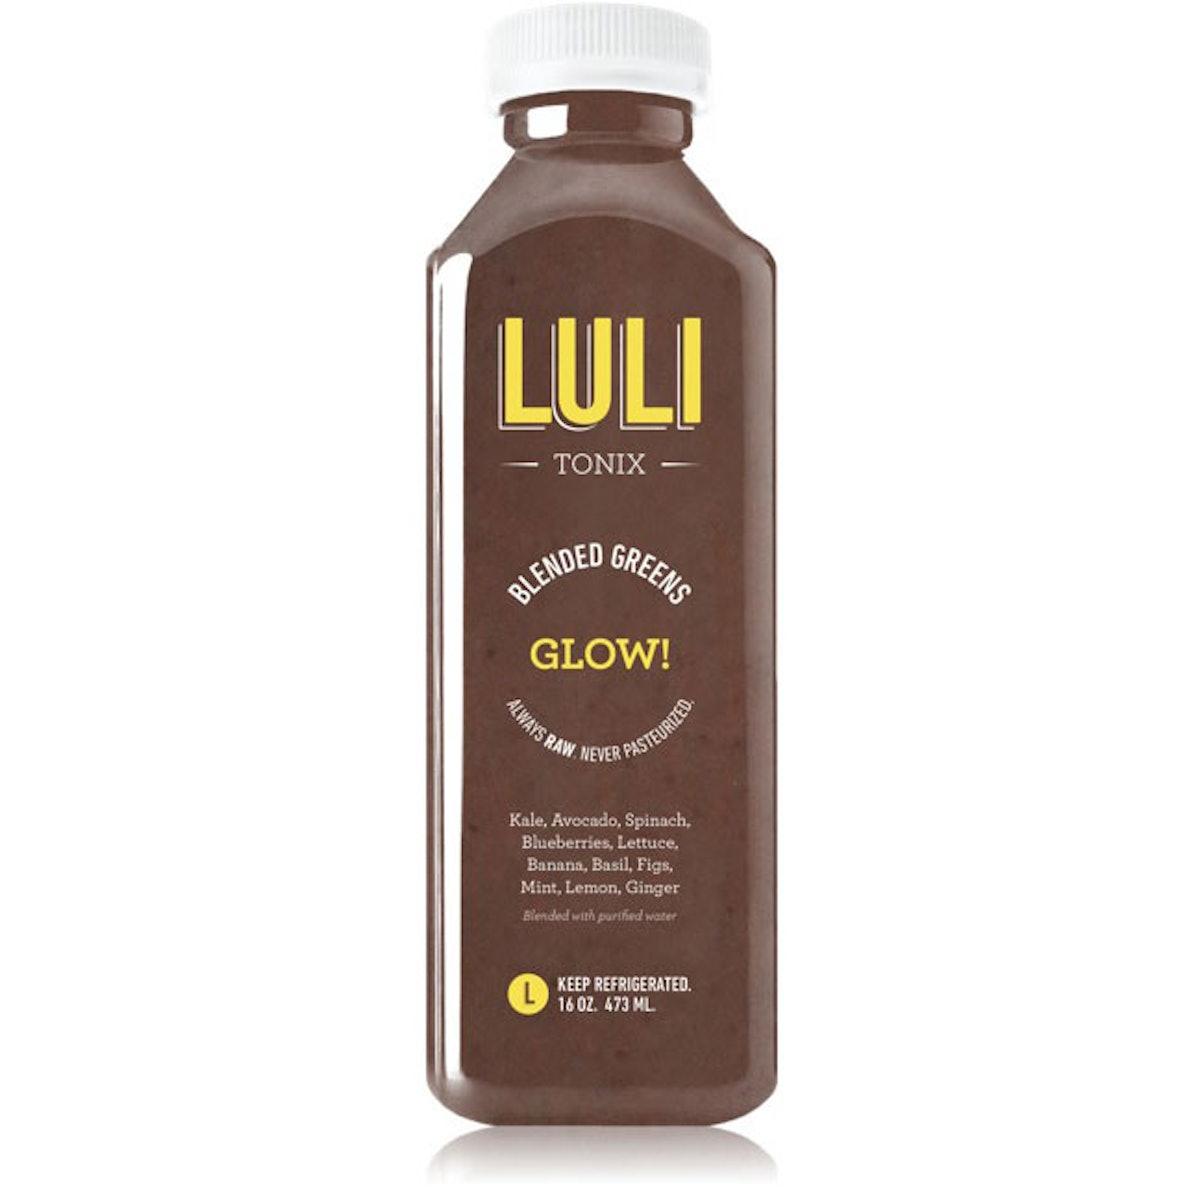 LuliTonix Glow! Juice